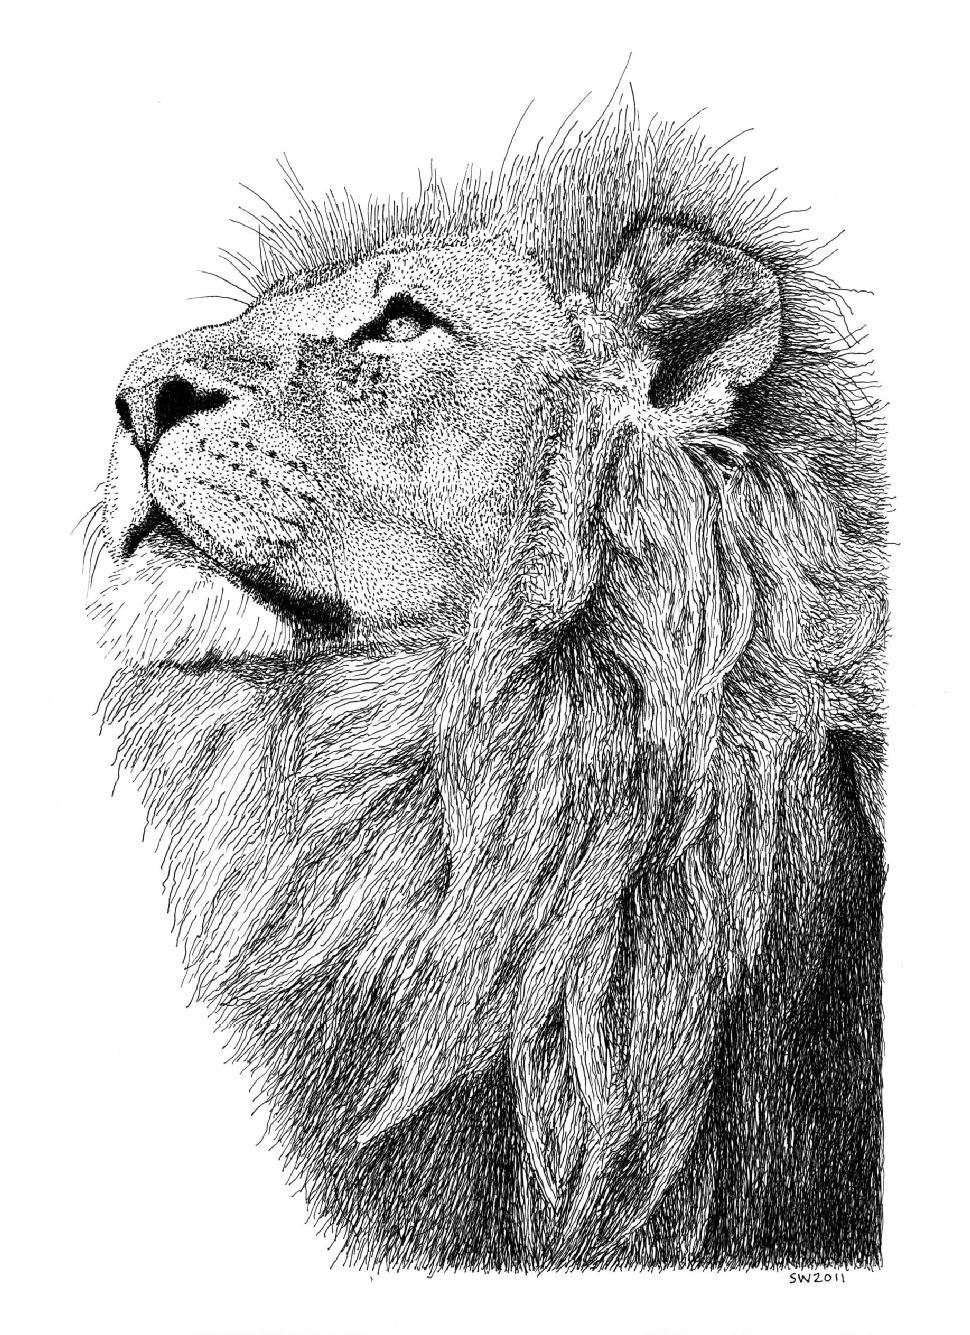 Drawn pen lion Pointillism Drawing/Landscape Ink Pen and